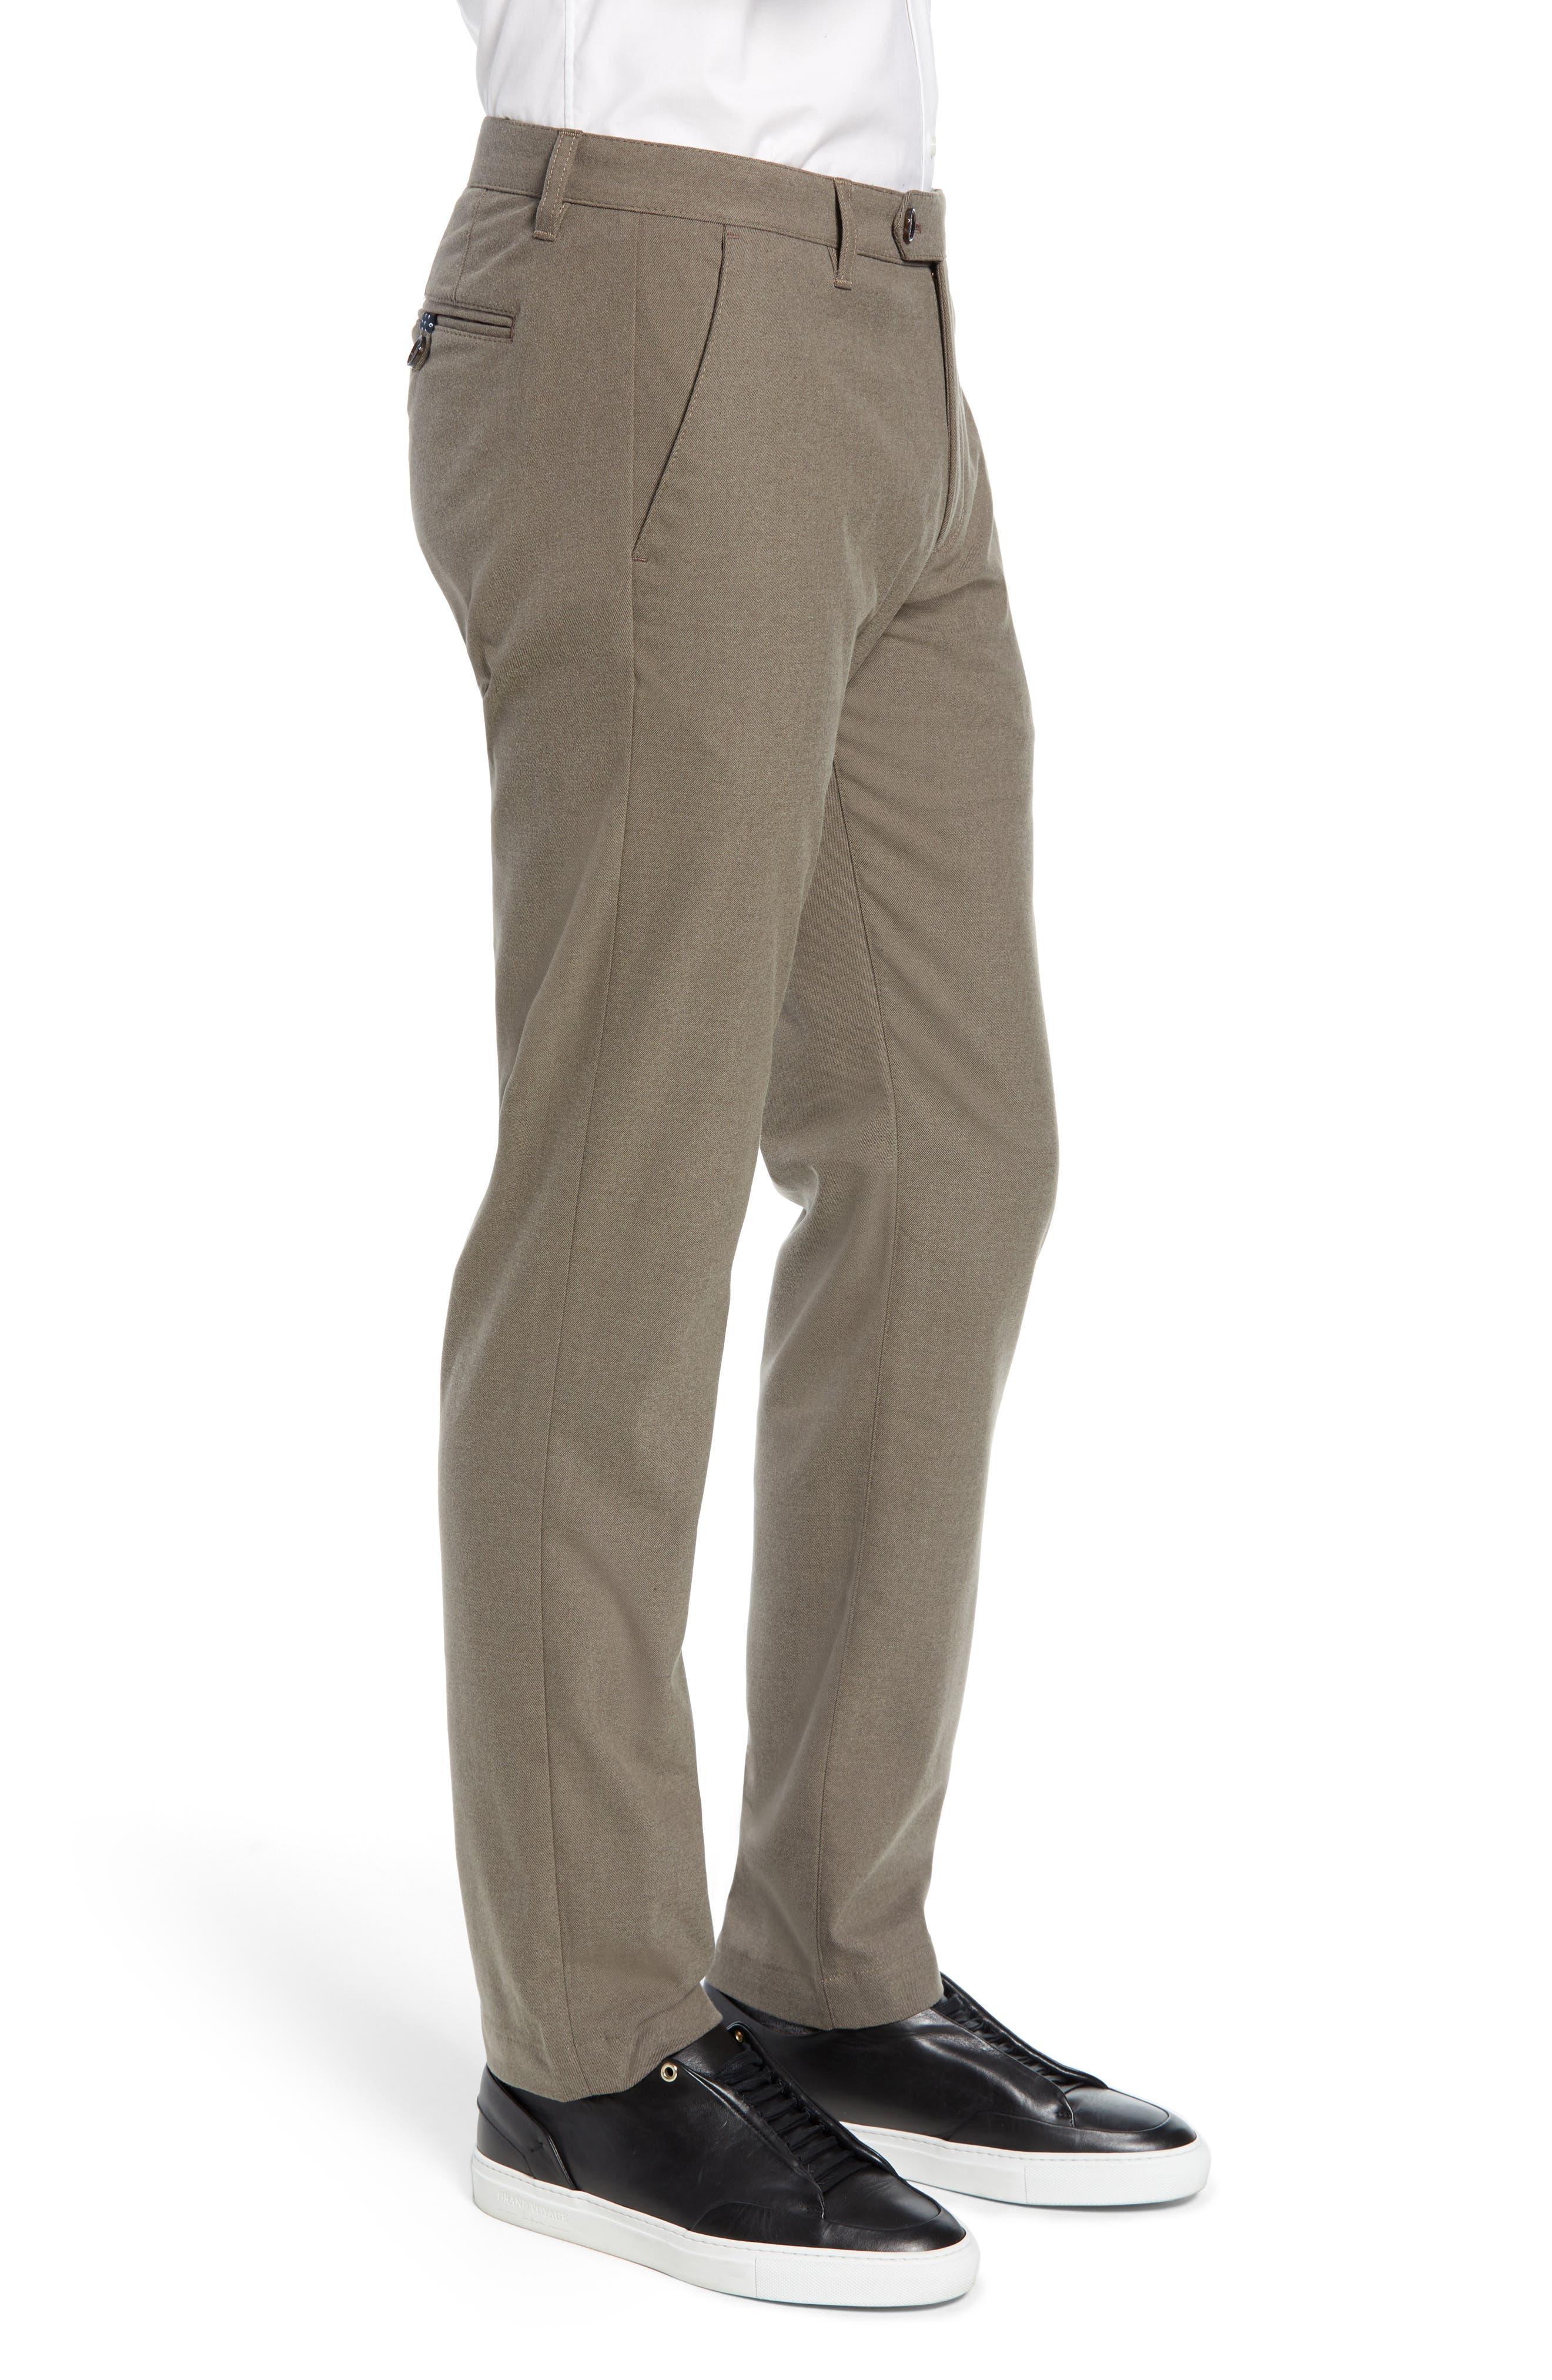 Semplin Slim Fit Brushed Trousers,                             Alternate thumbnail 3, color,                             NATURAL